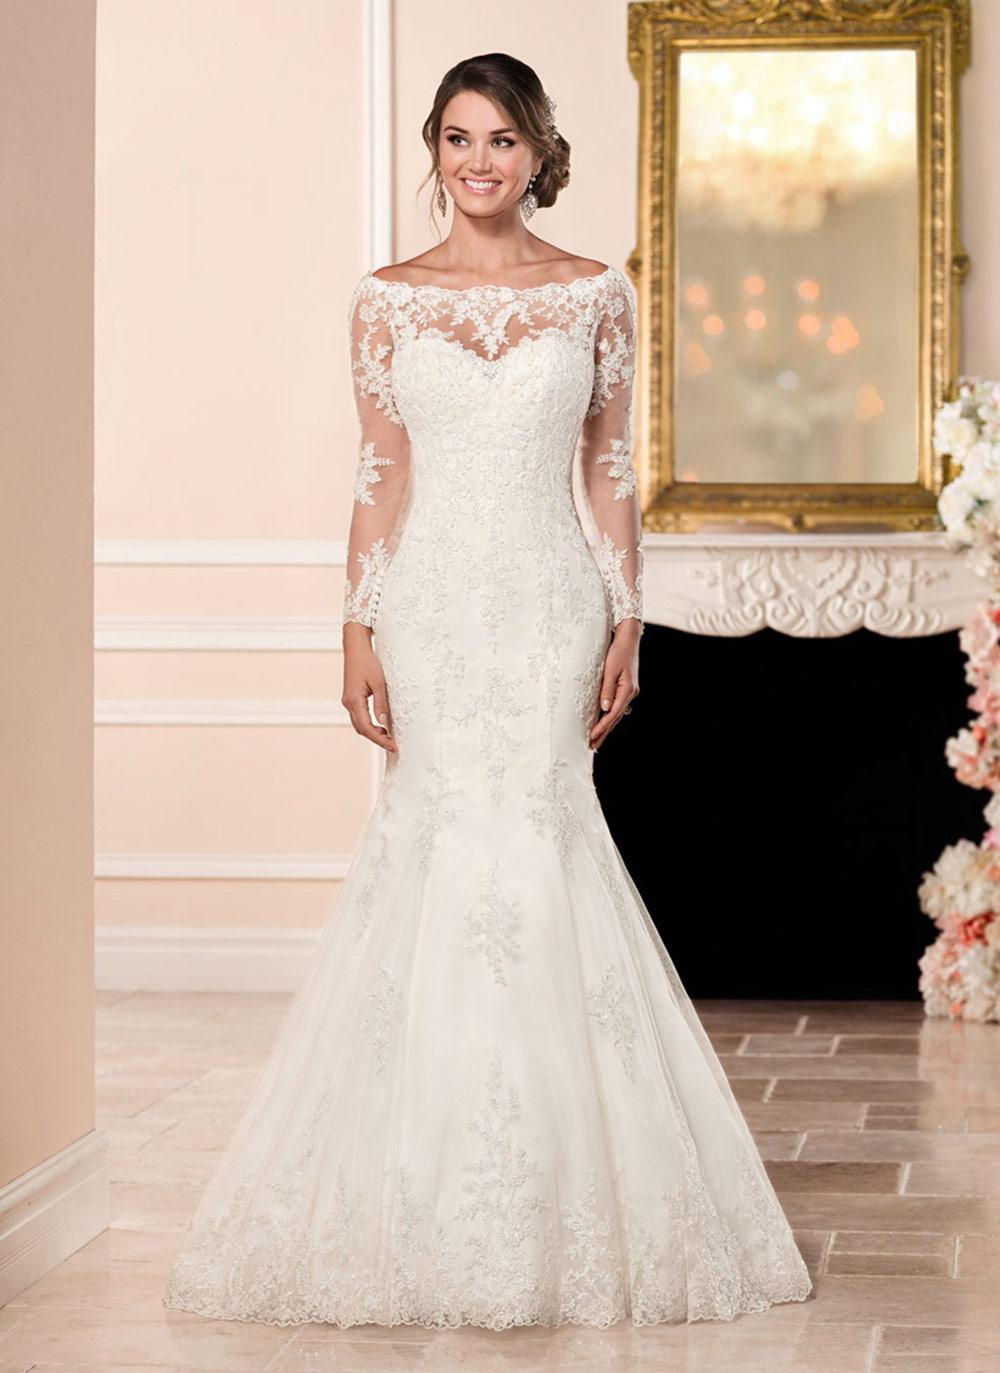 7494a0c1301 ... Brides of Berkhamsted - Wedding Dresses - Hertfordshire ...